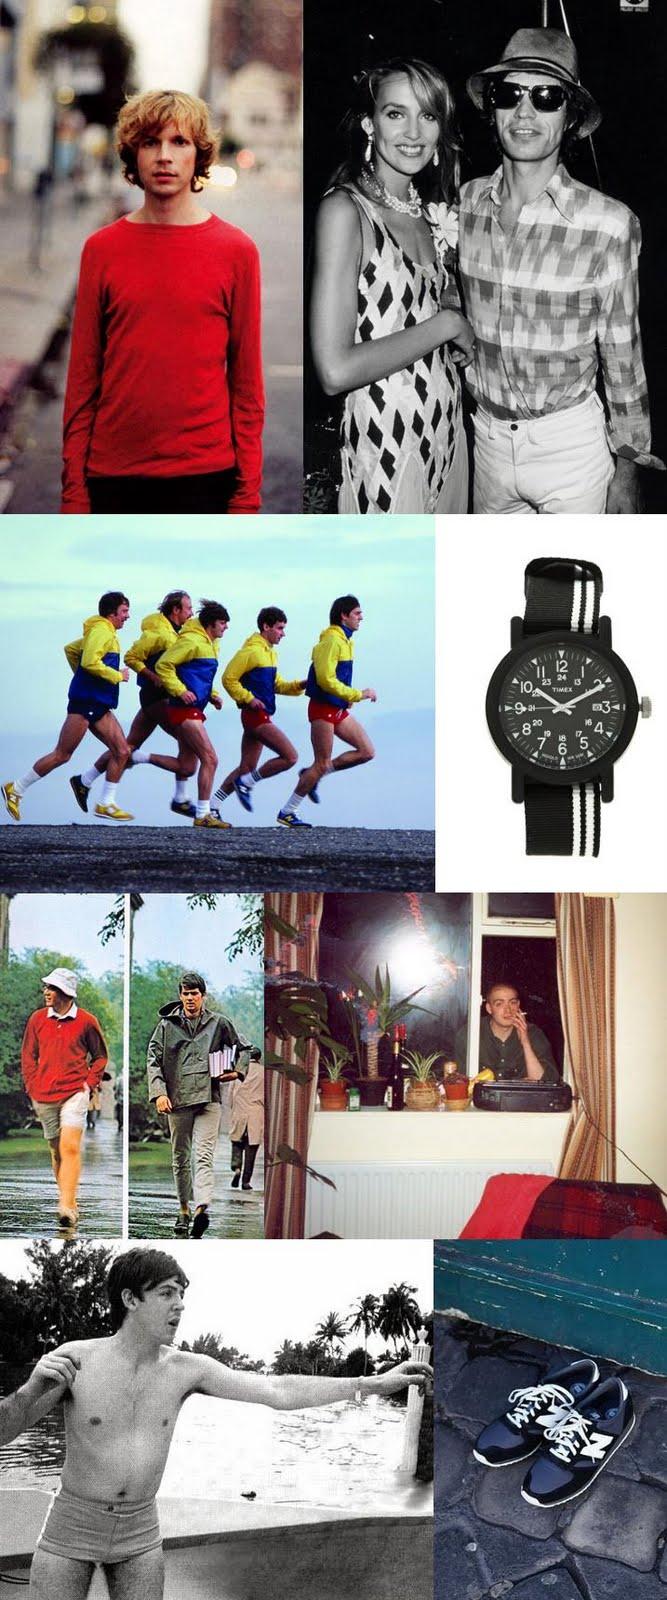 http://3.bp.blogspot.com/_PYqHLh0dSJ4/TH0_vpfpx3I/AAAAAAAAFqo/uWF8gloRUBQ/s1600/guy+style.jpg